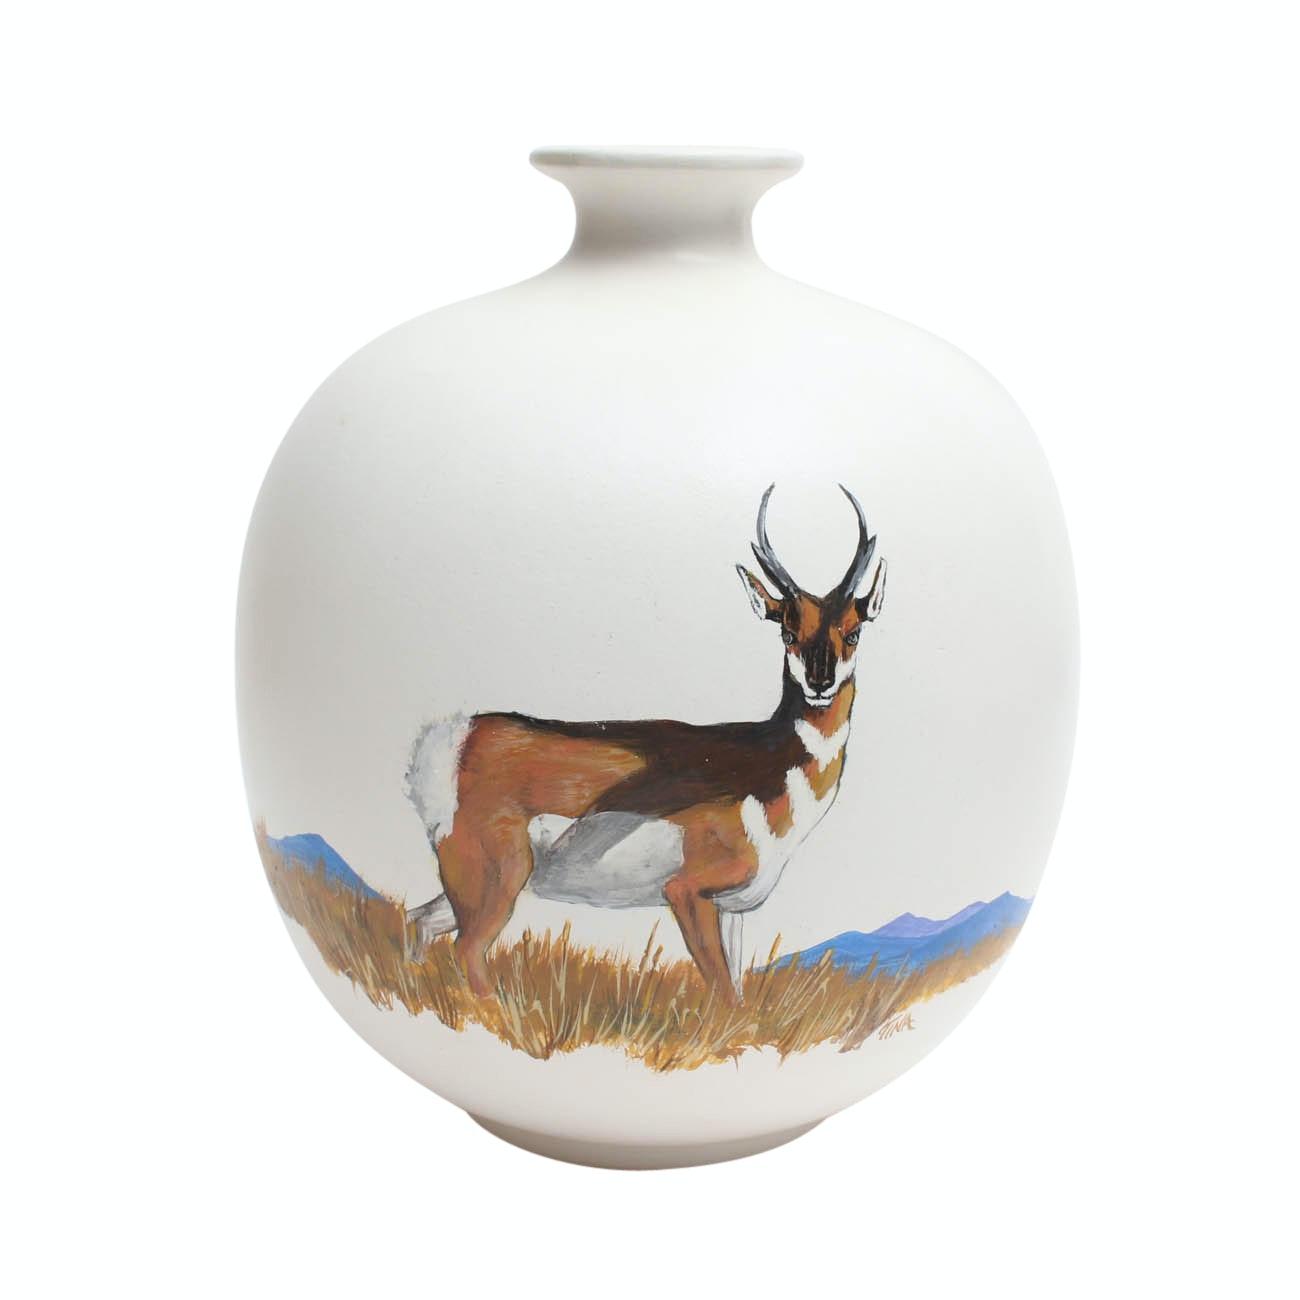 Hand-Painted Slip Cast Ceramic Deer Vase